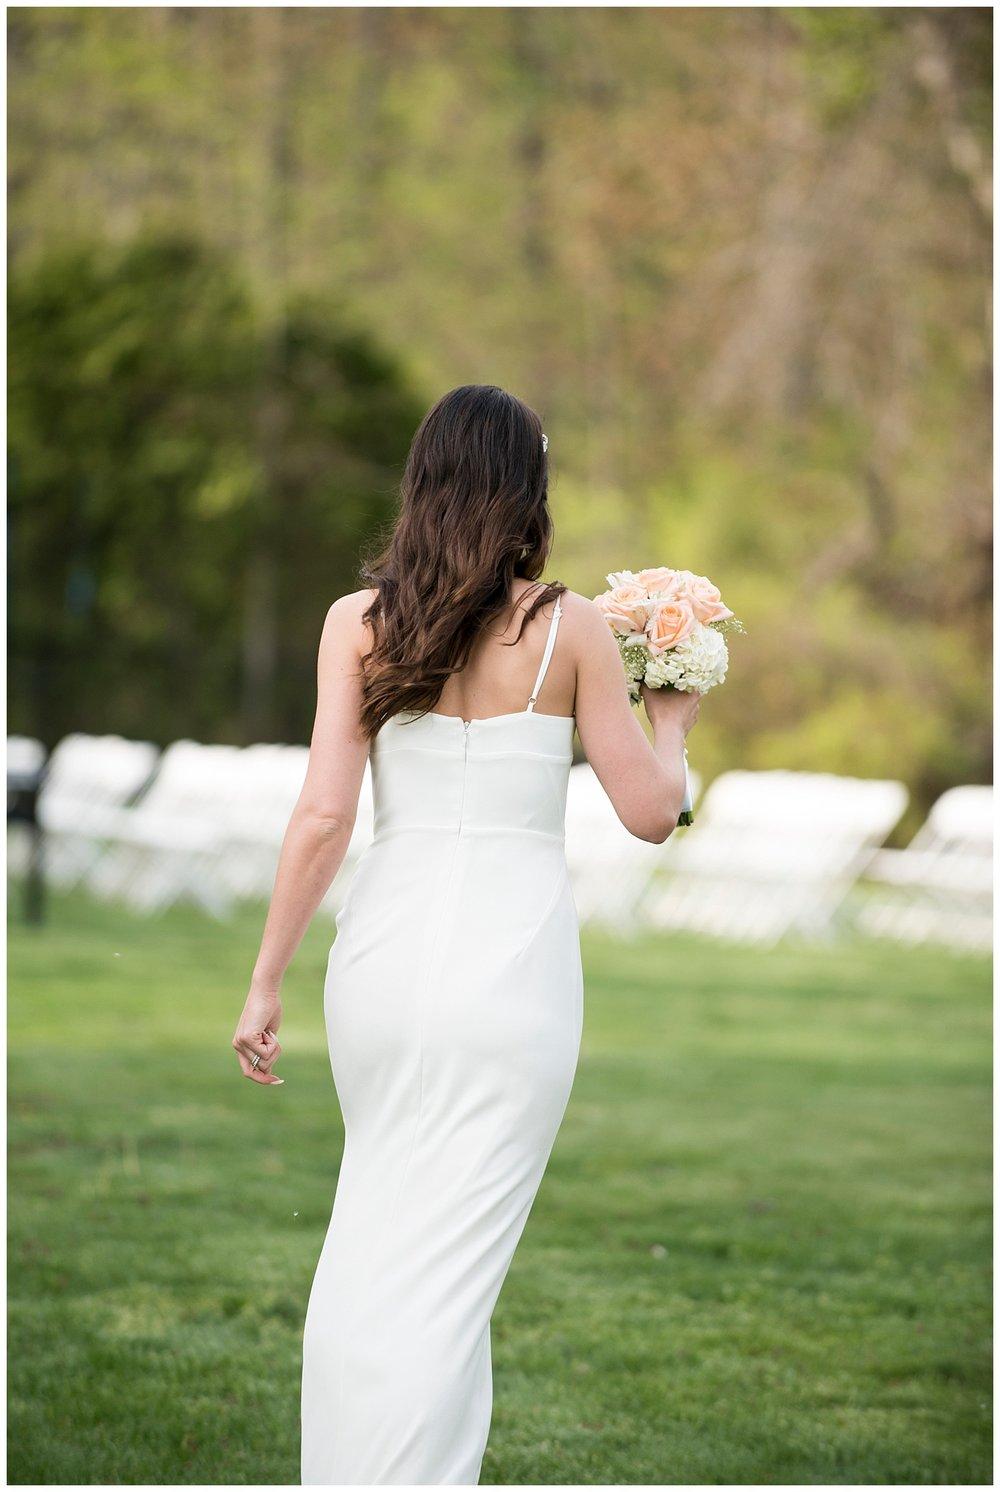 Bride Walking   Intimate Wedding Photographer   New York State Wedding Photographer   Farm Wedding Photographer   Apollo Fields Wedding Photojournalism